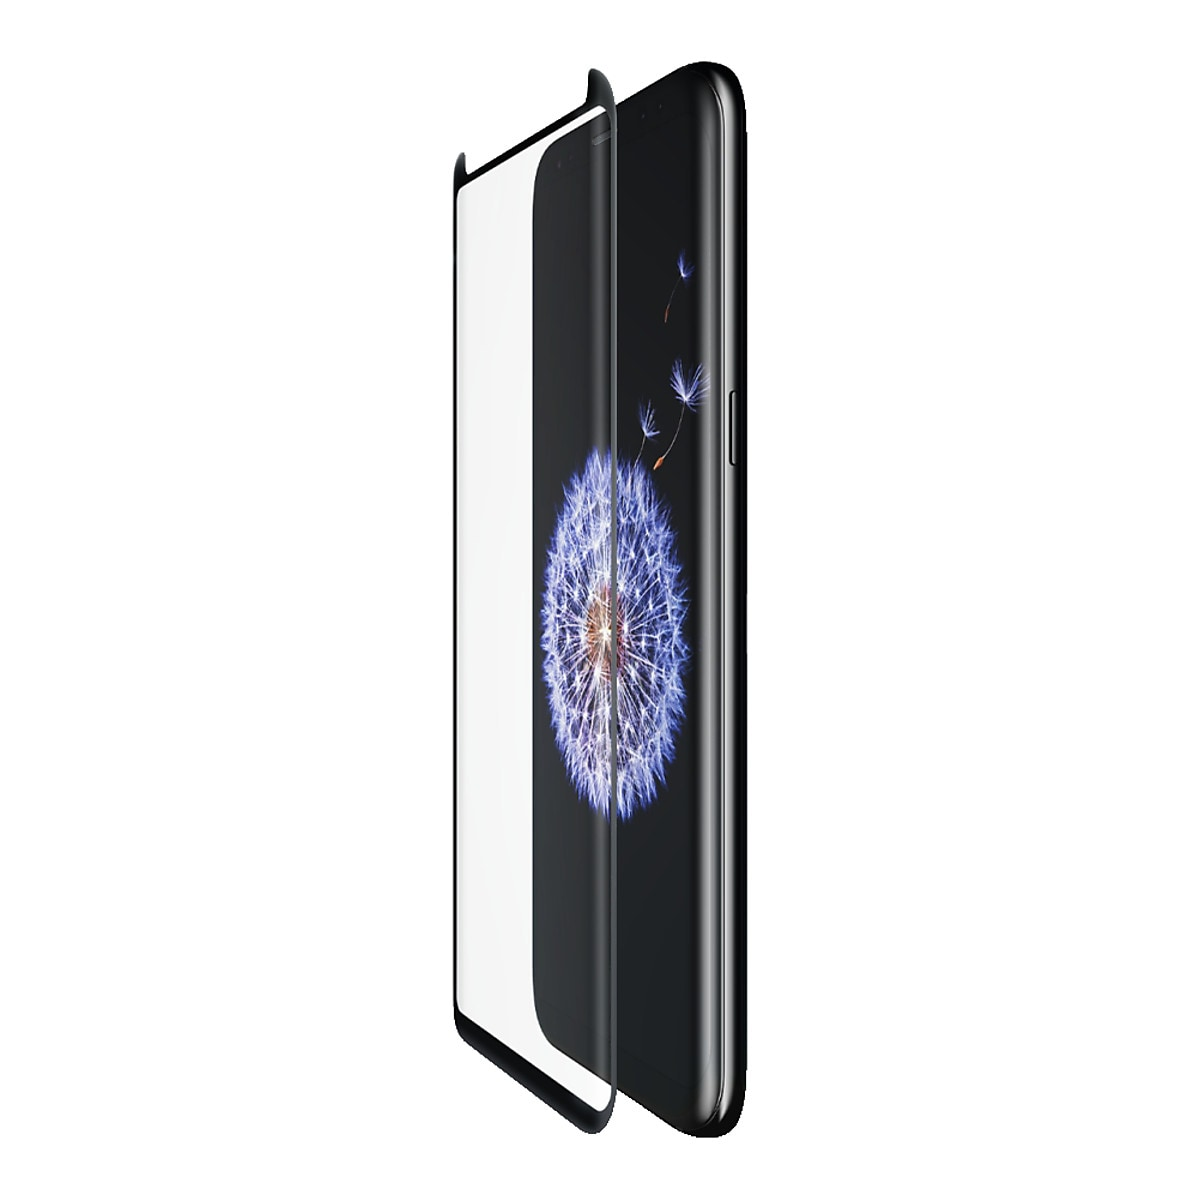 Skärmskydd Samsung Galaxy S9 Plus Belkin Screenforce TemperedCurve